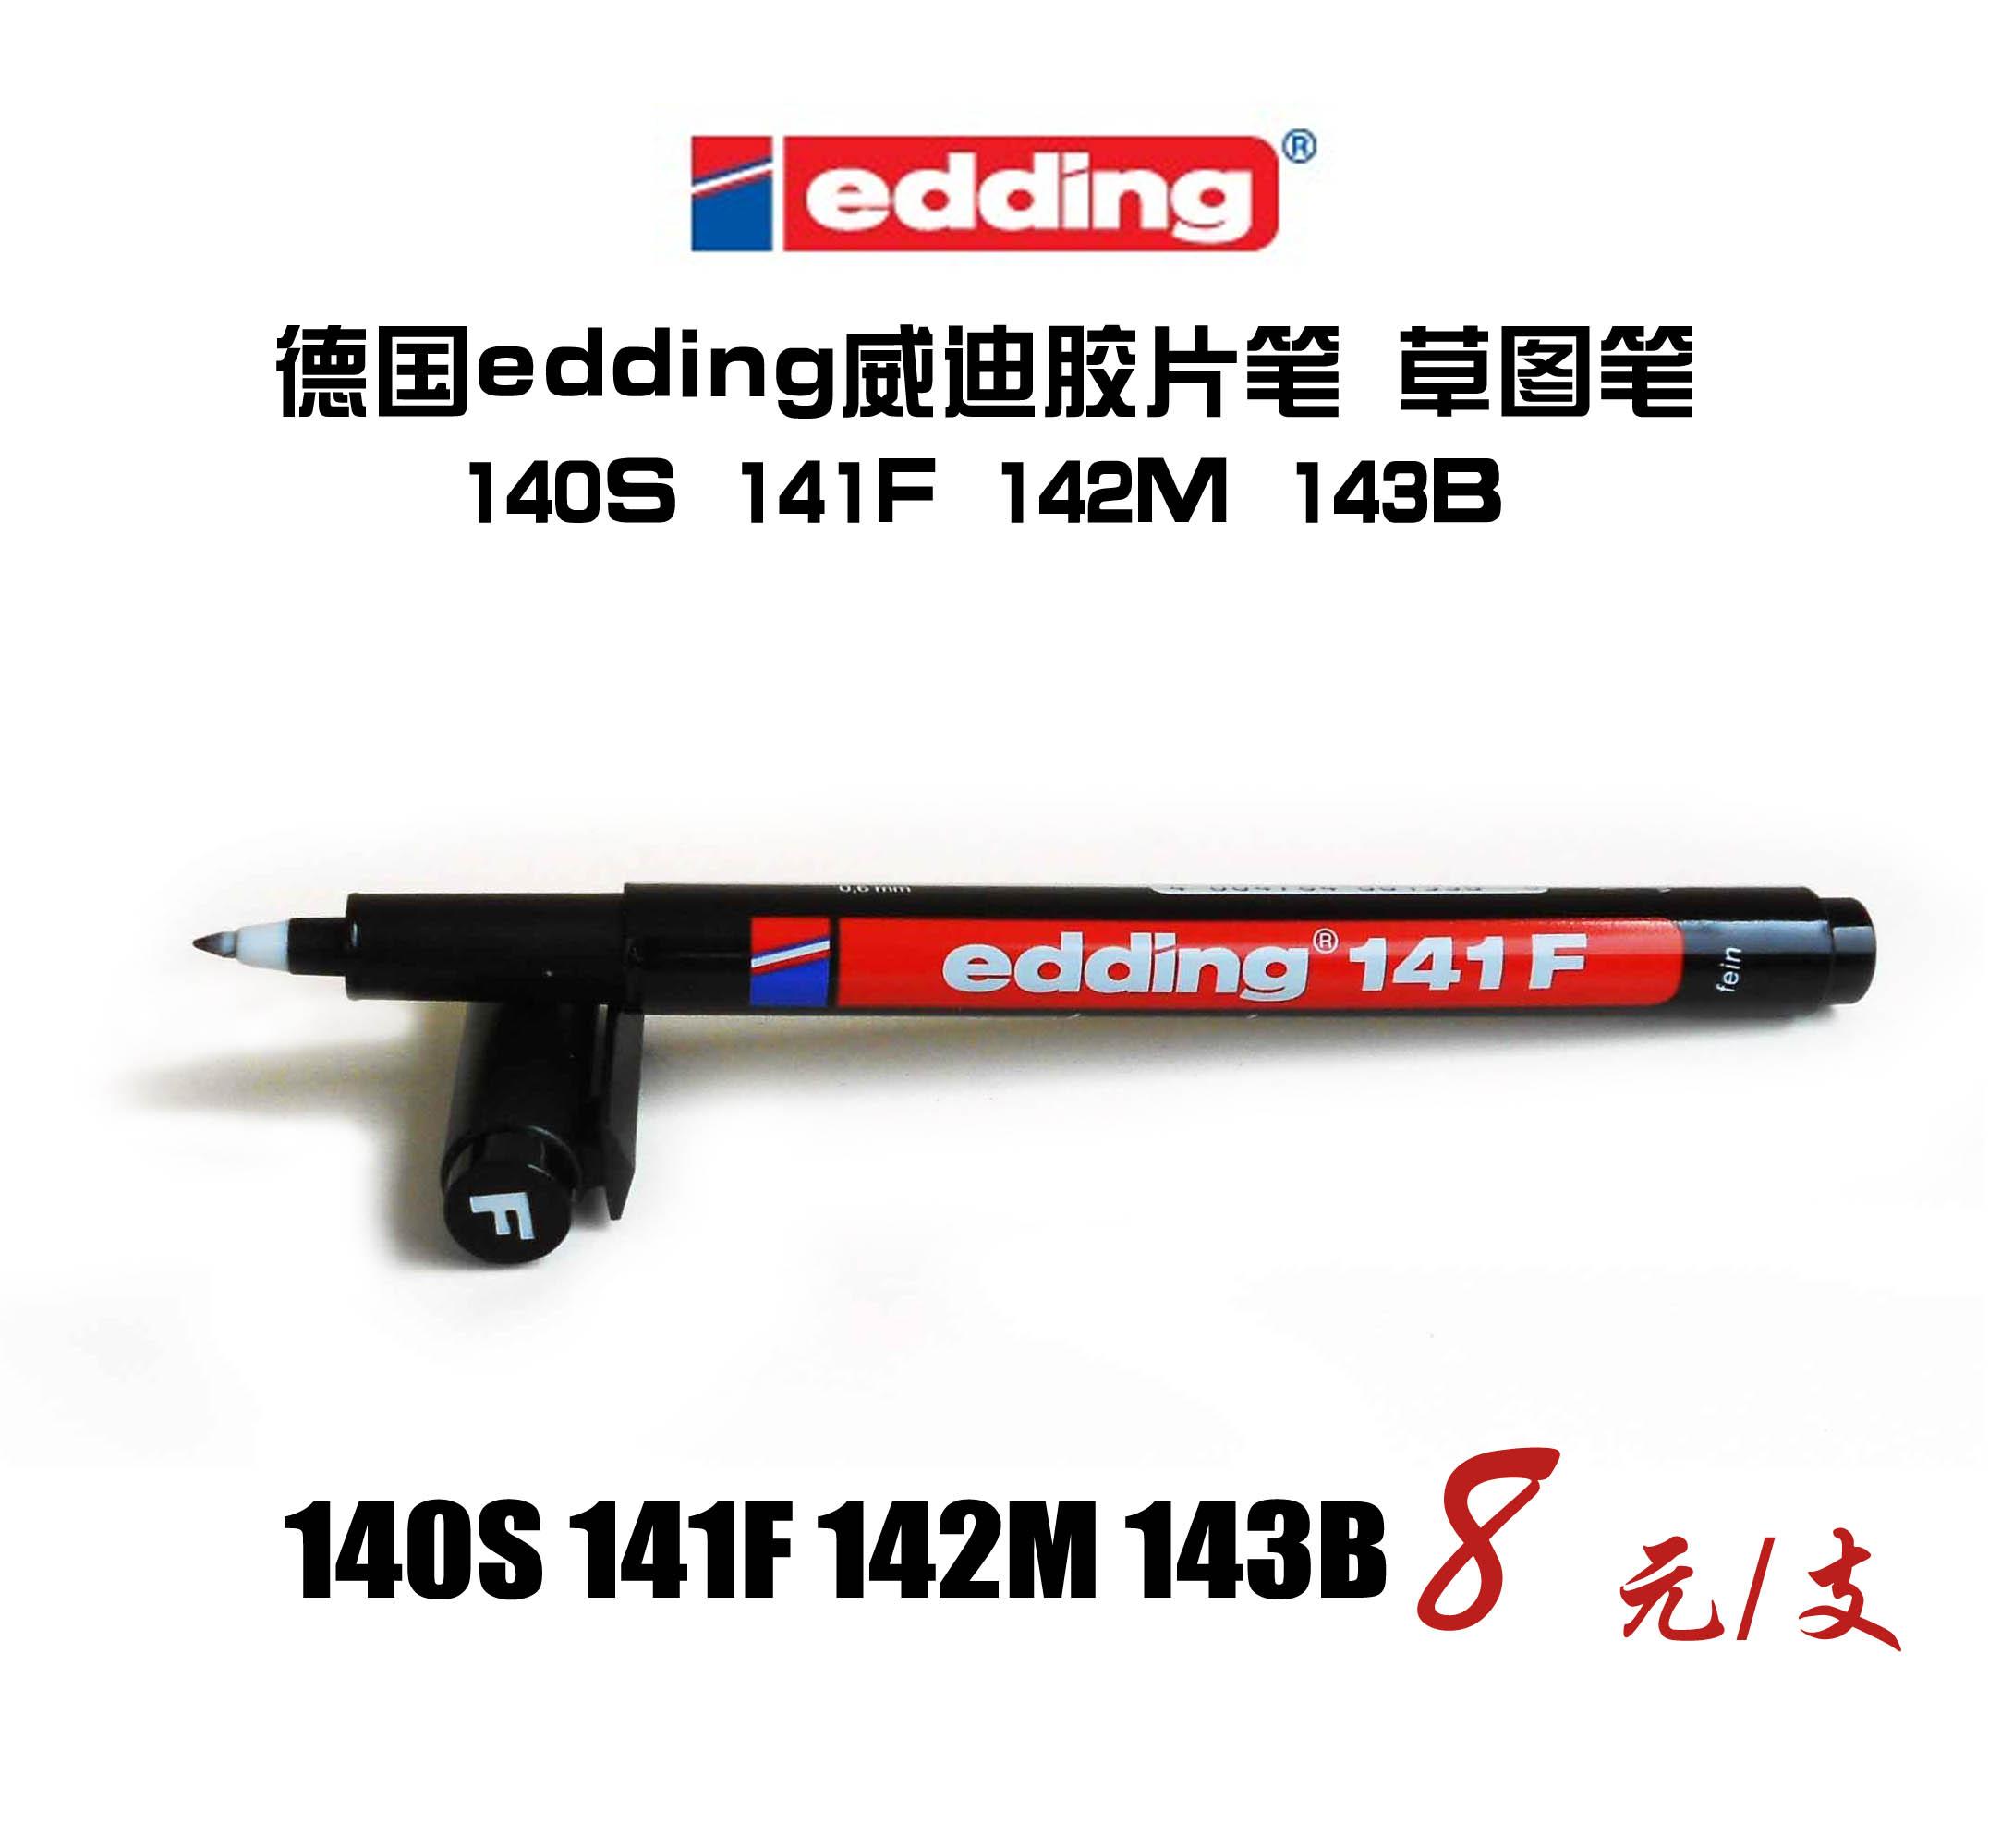 edding艾迪草图笔 一次性针管笔 胶片笔 140S 141F 142M 143B